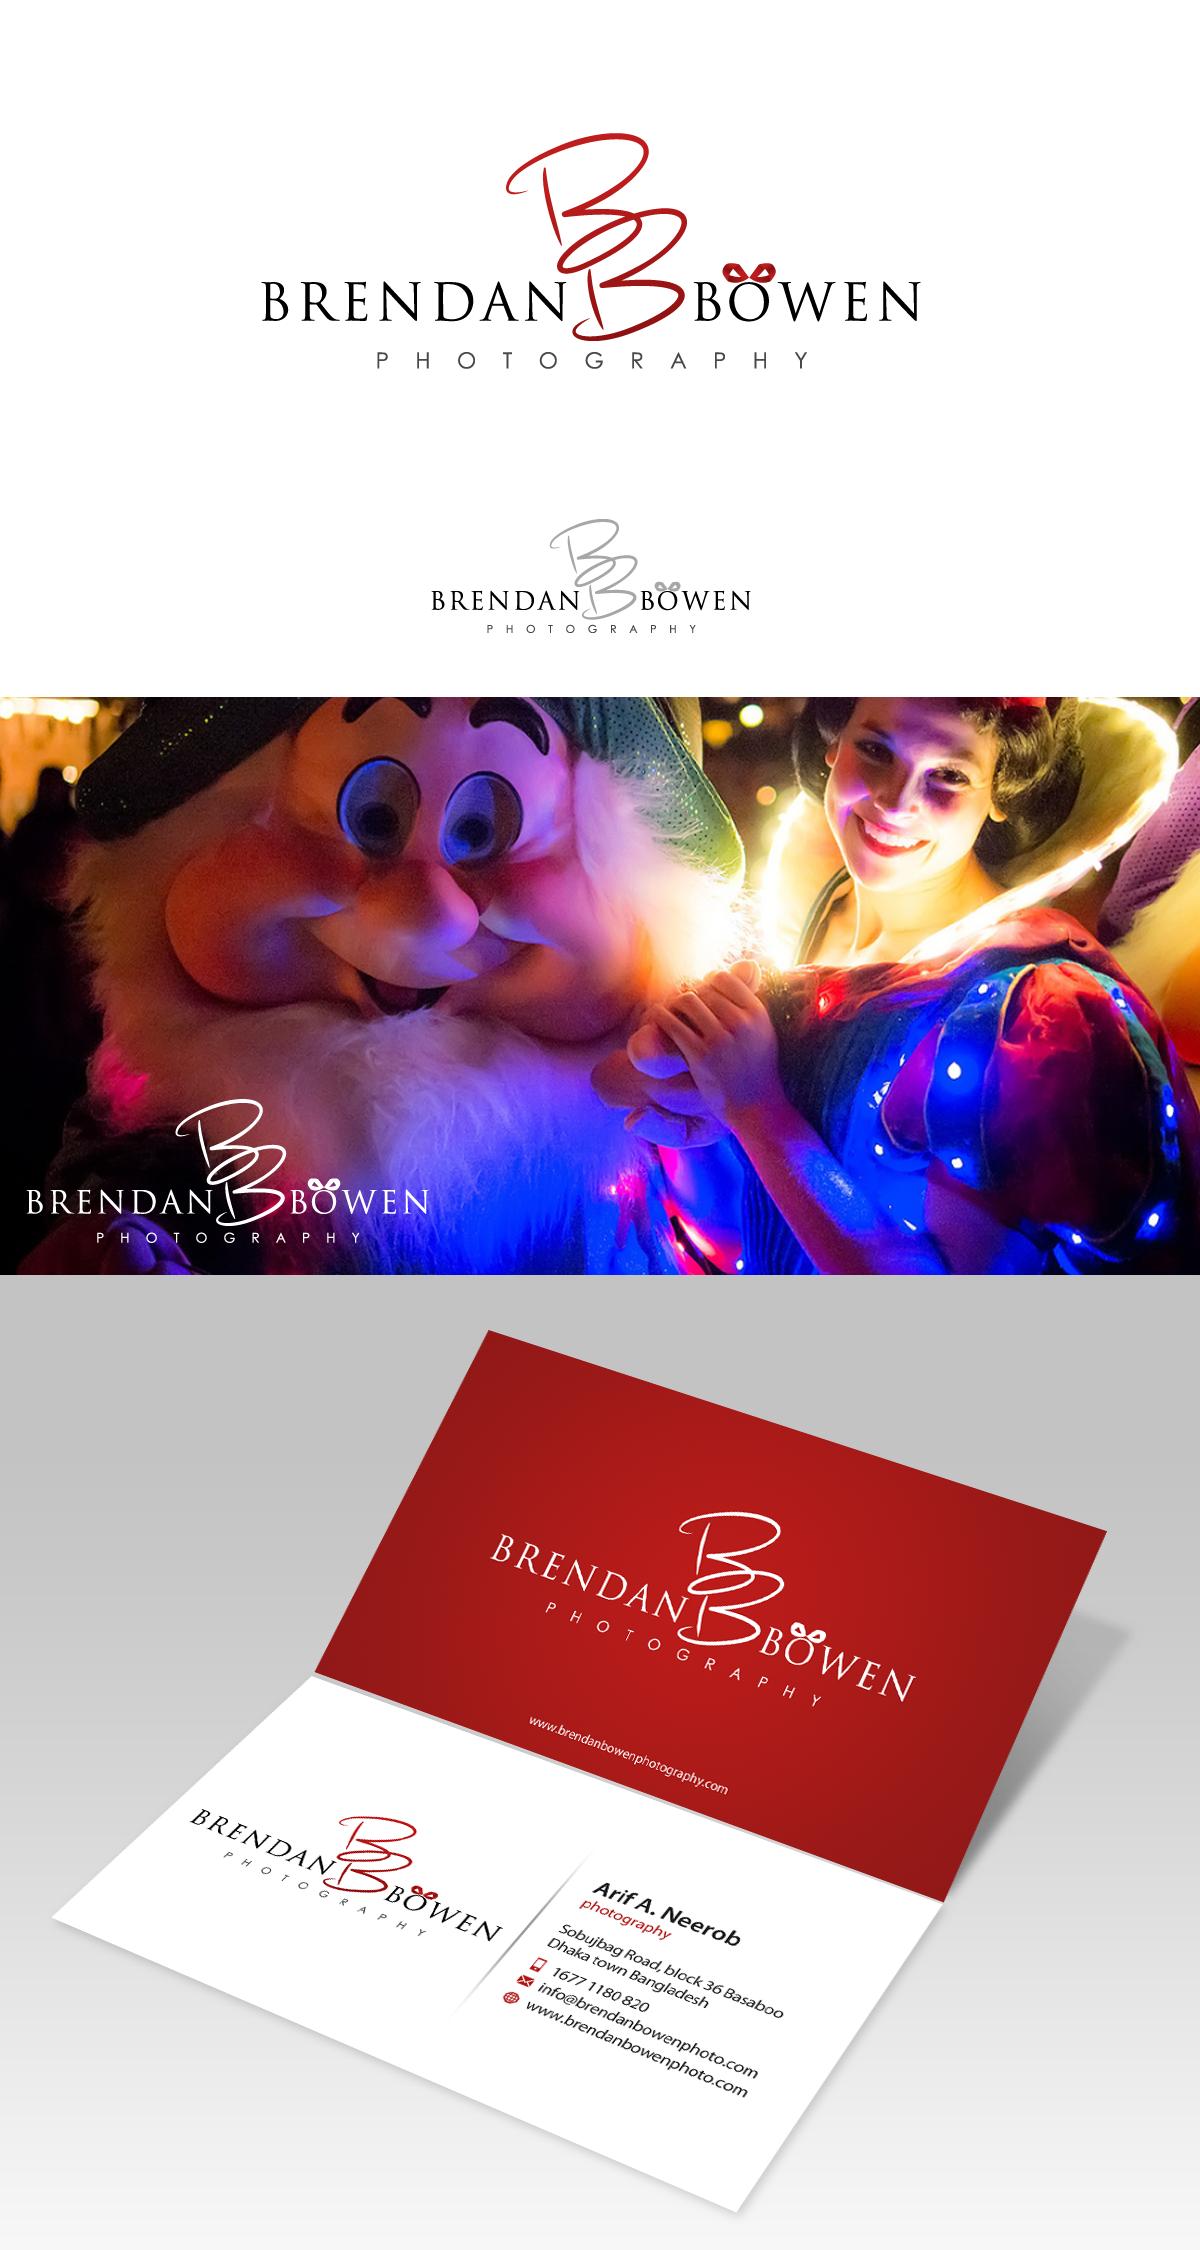 Brendan Bowen Photography needs a new logo